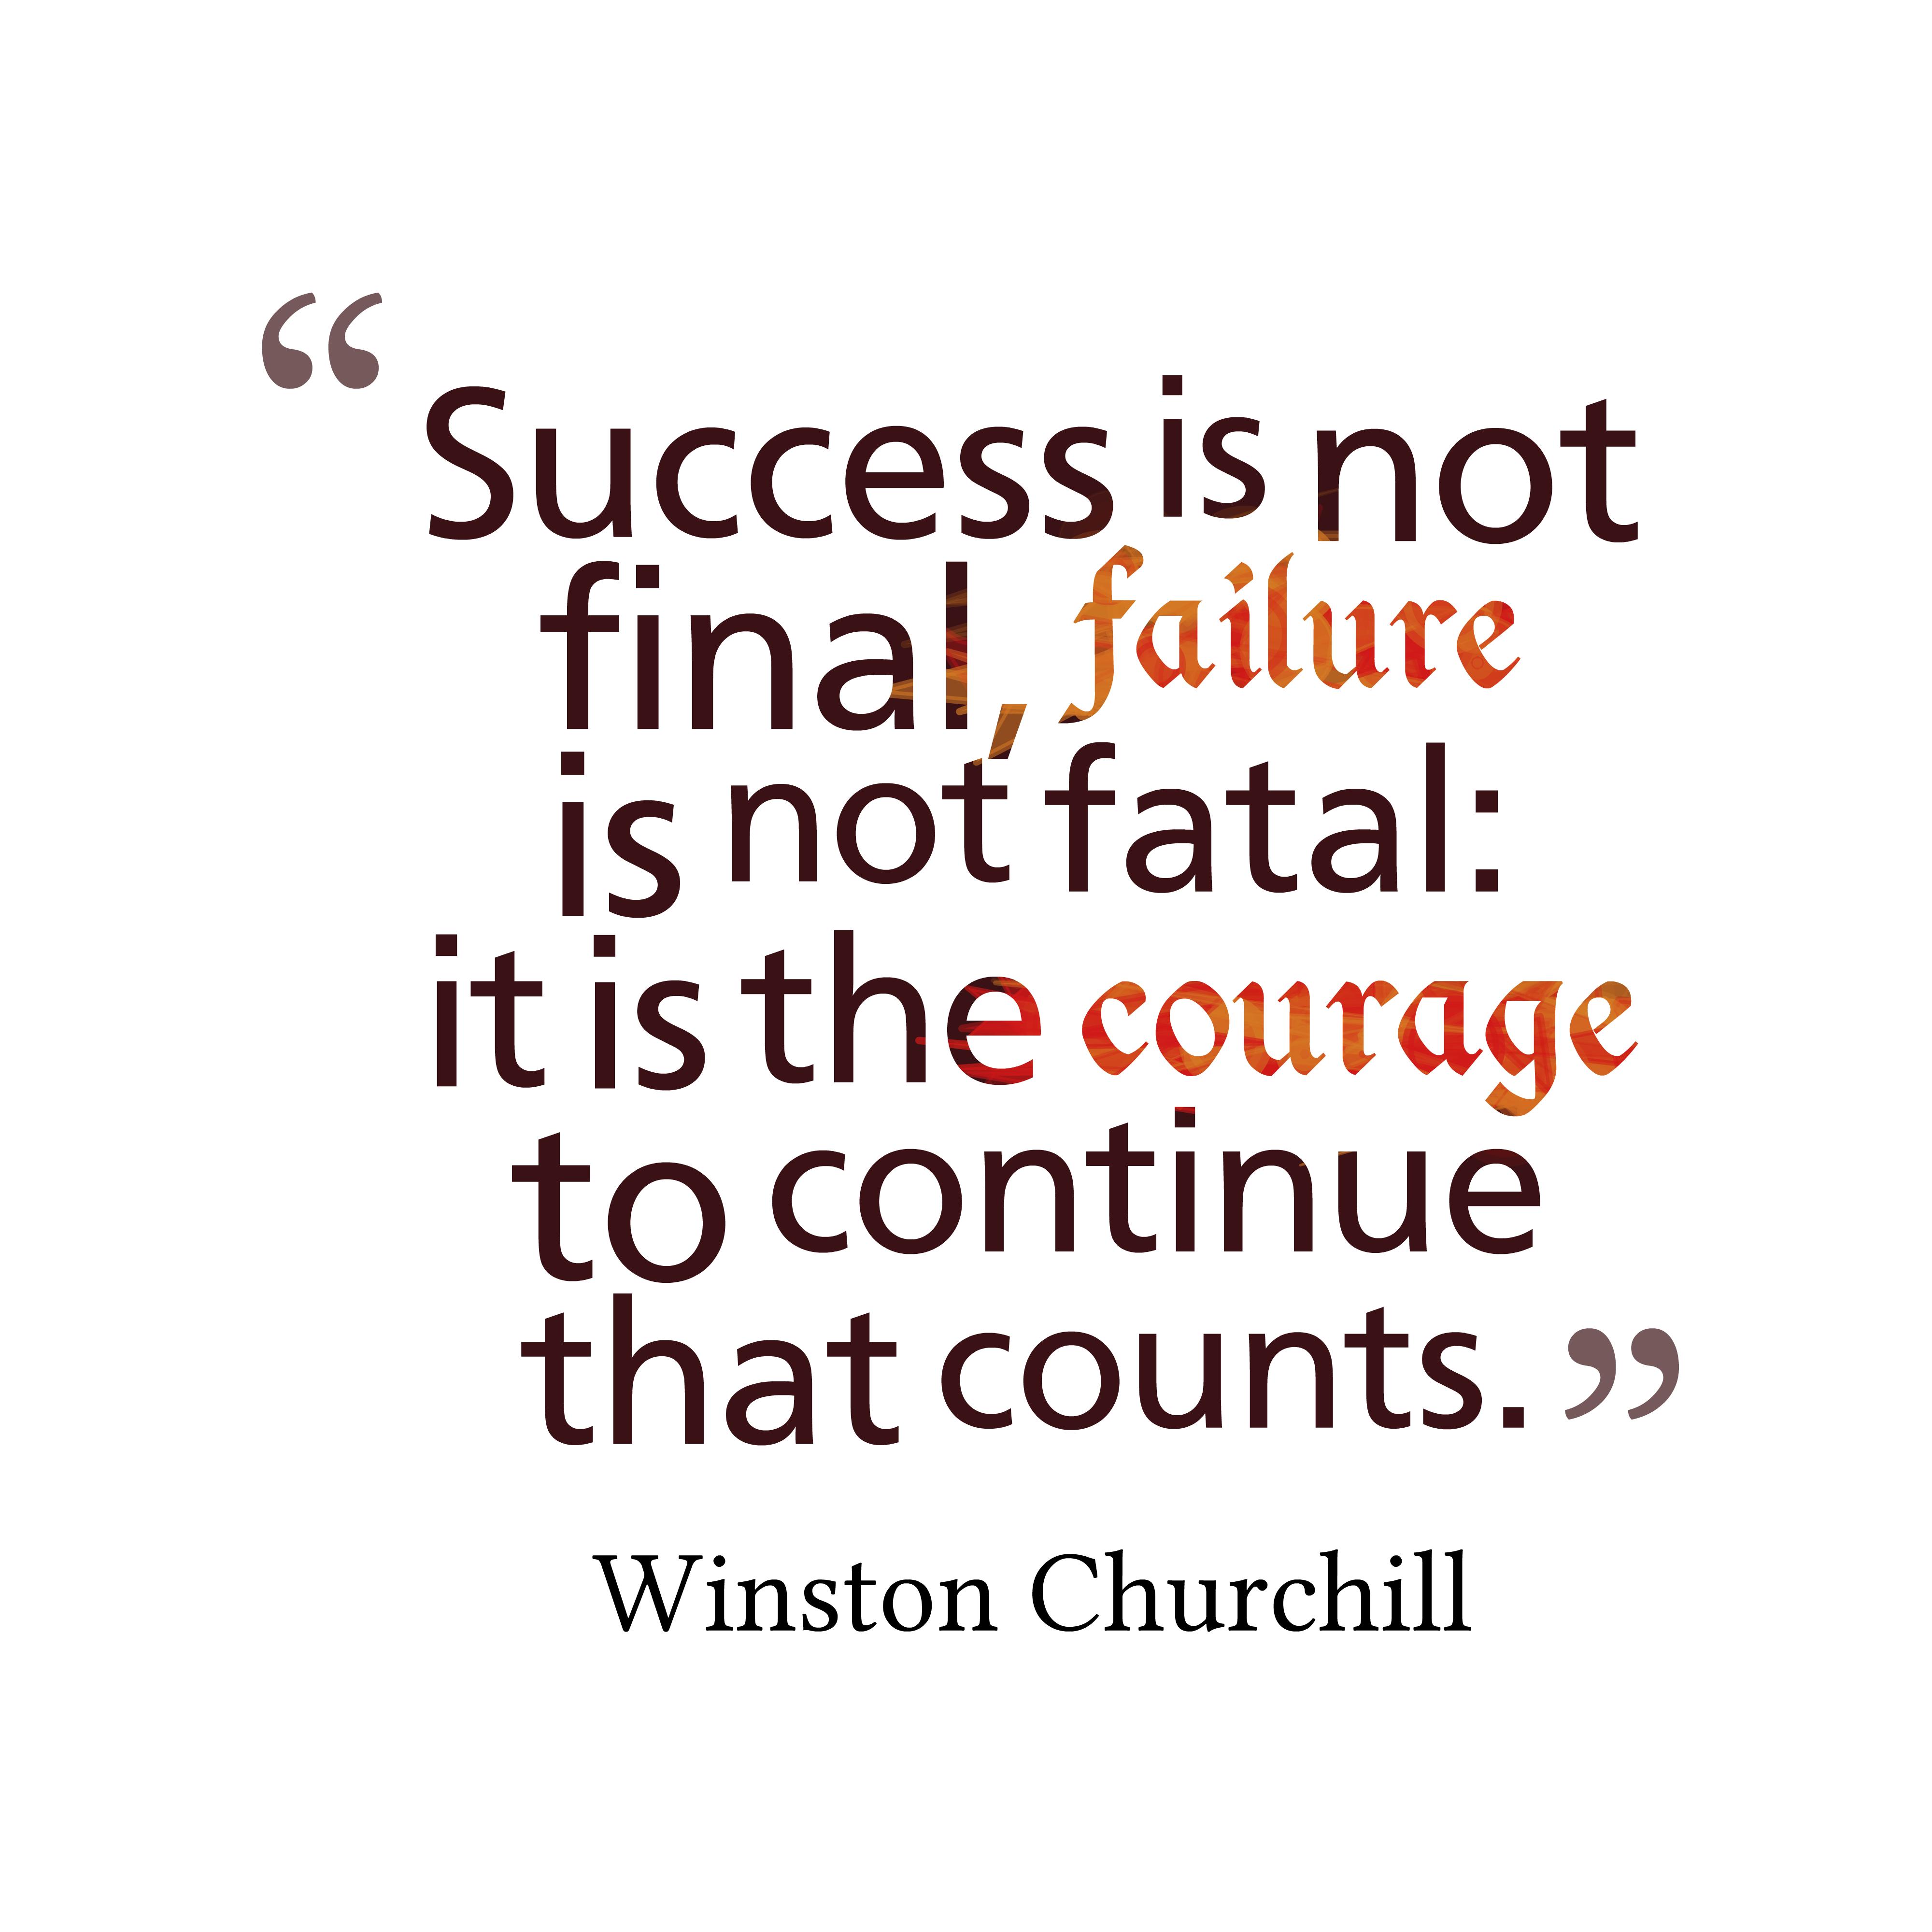 Inspirational Quotes About Failure: Failure Quotes. QuotesGram